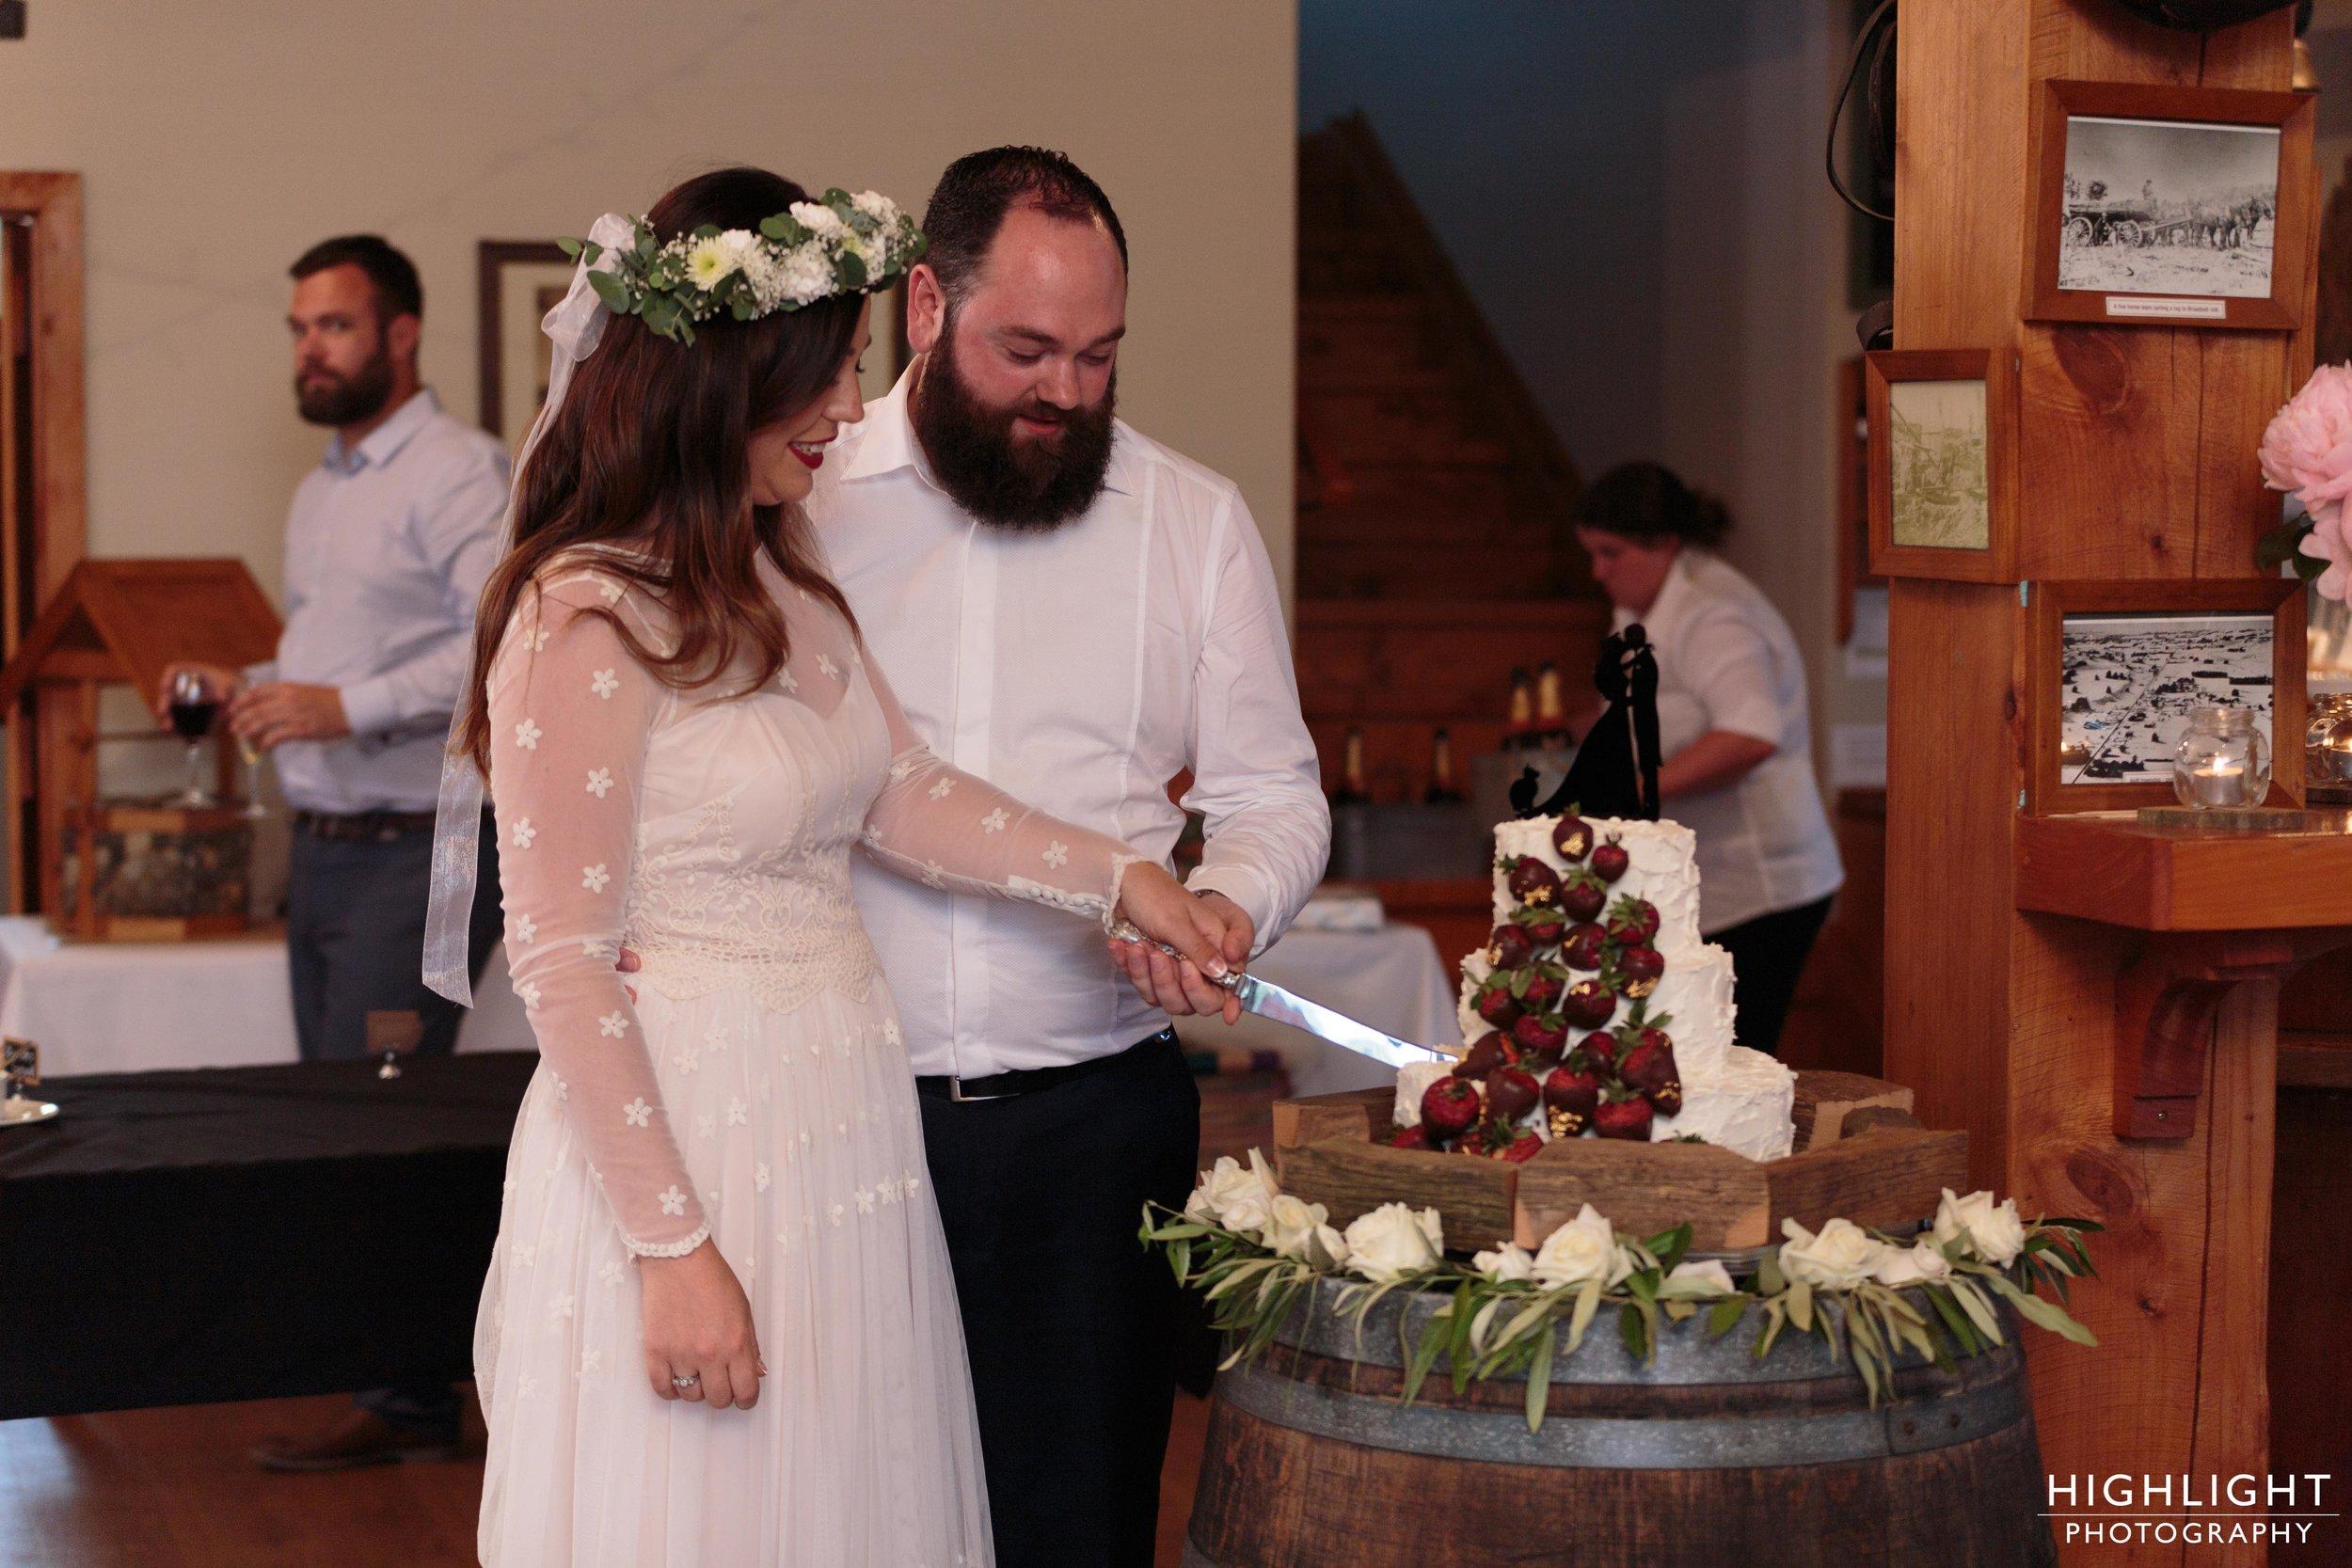 highlight-wedding-photography-new-zealand-makoura-lodge-wedding-154.jpg